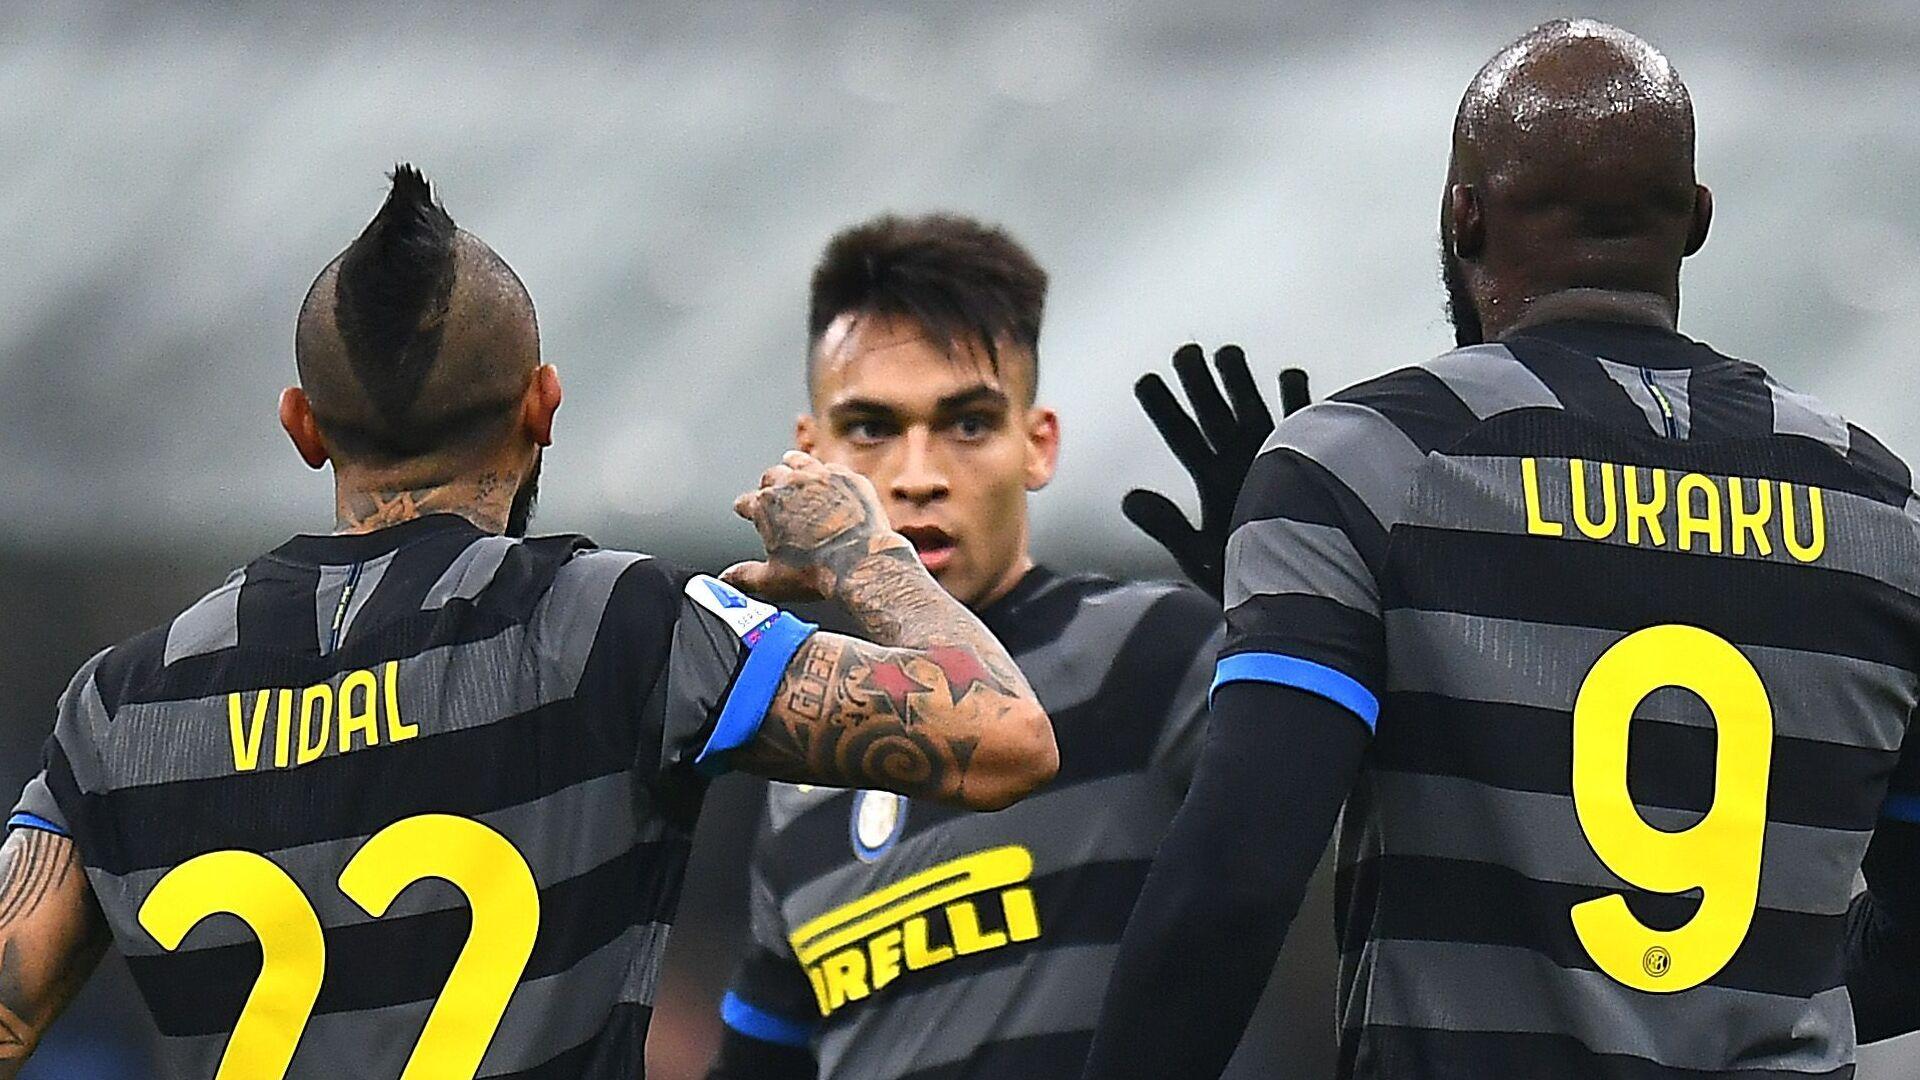 Inter 4-0 Benevento: Lukaku brace secures easy win